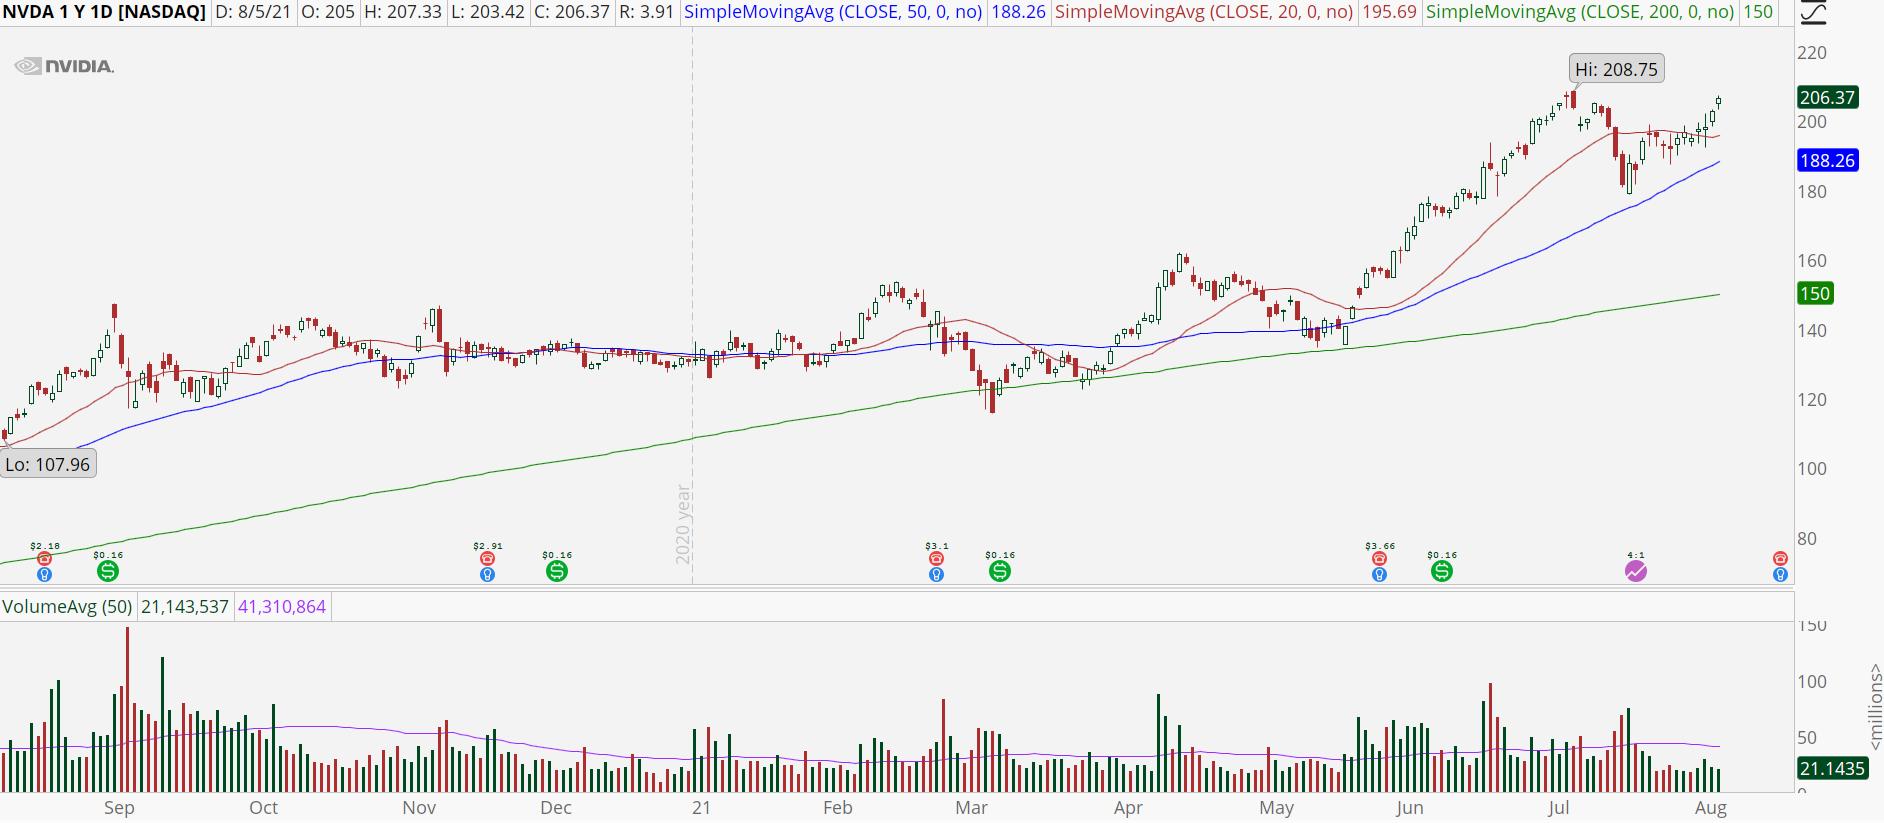 Nvidia (NVDA) stock chart with bullish uptrend